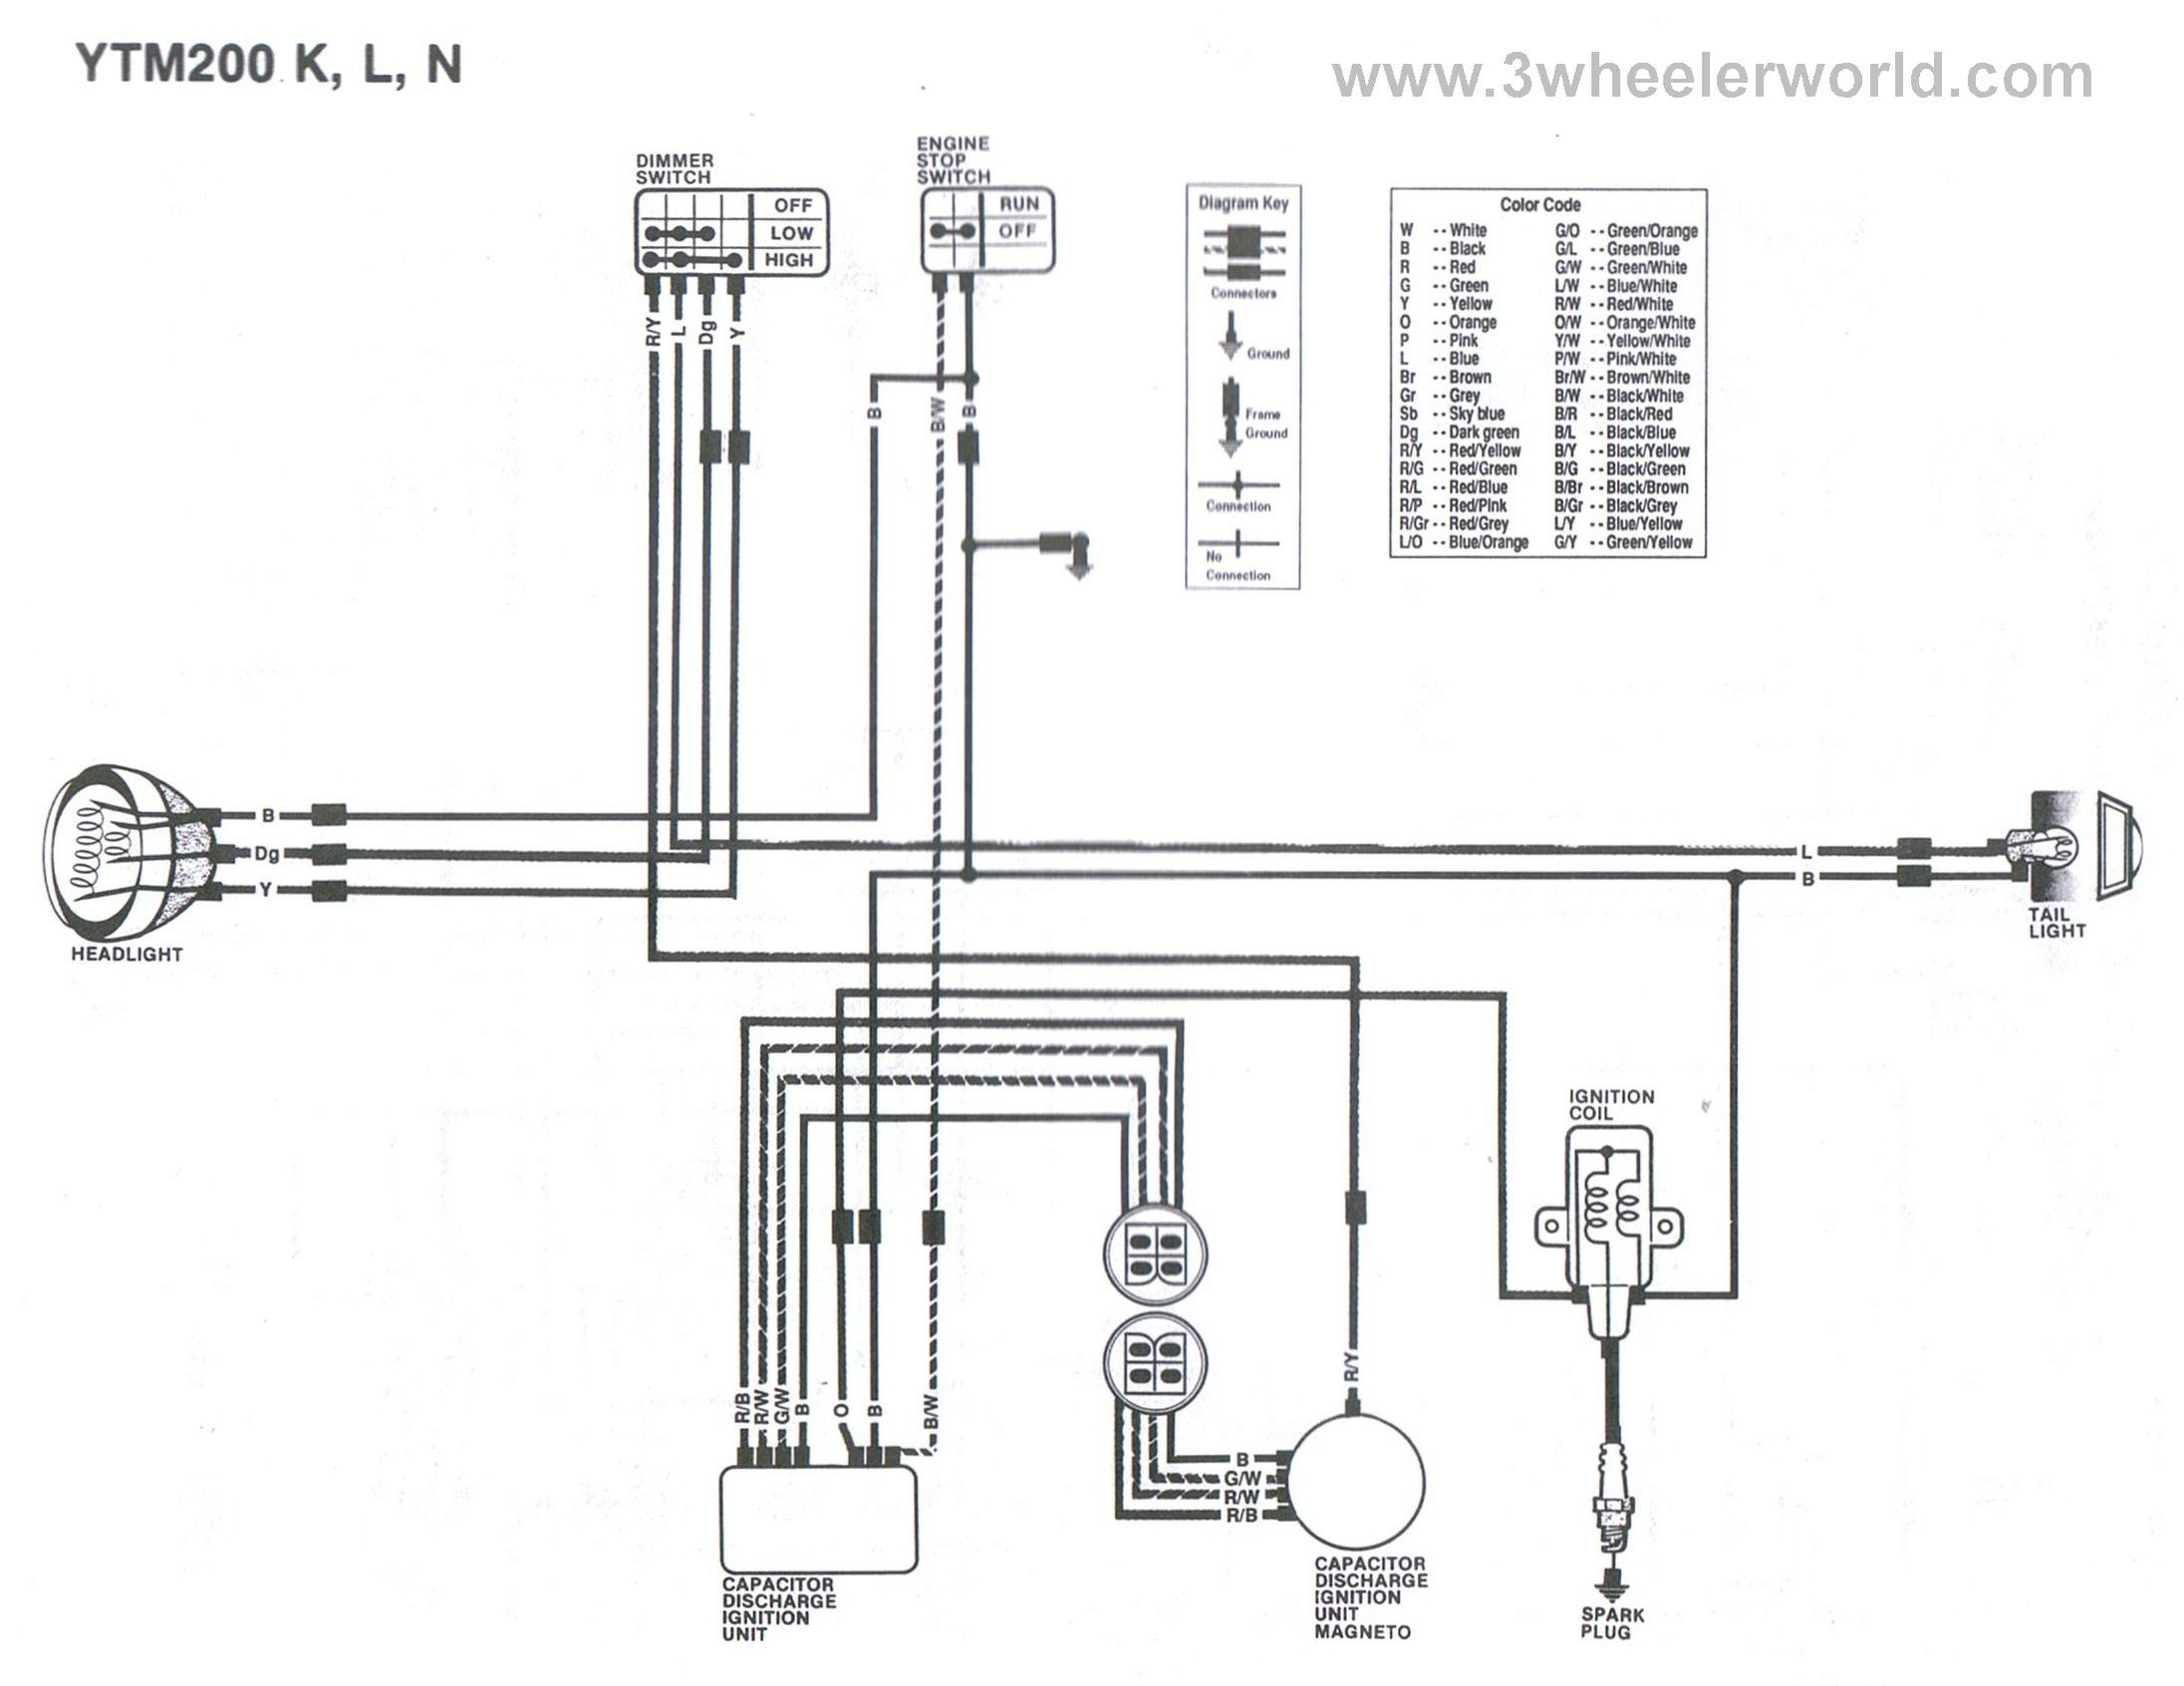 1985 toyota pickup headlight wiring diagram wiring diagram 1984 toyota pickup alternator wiring diagram image